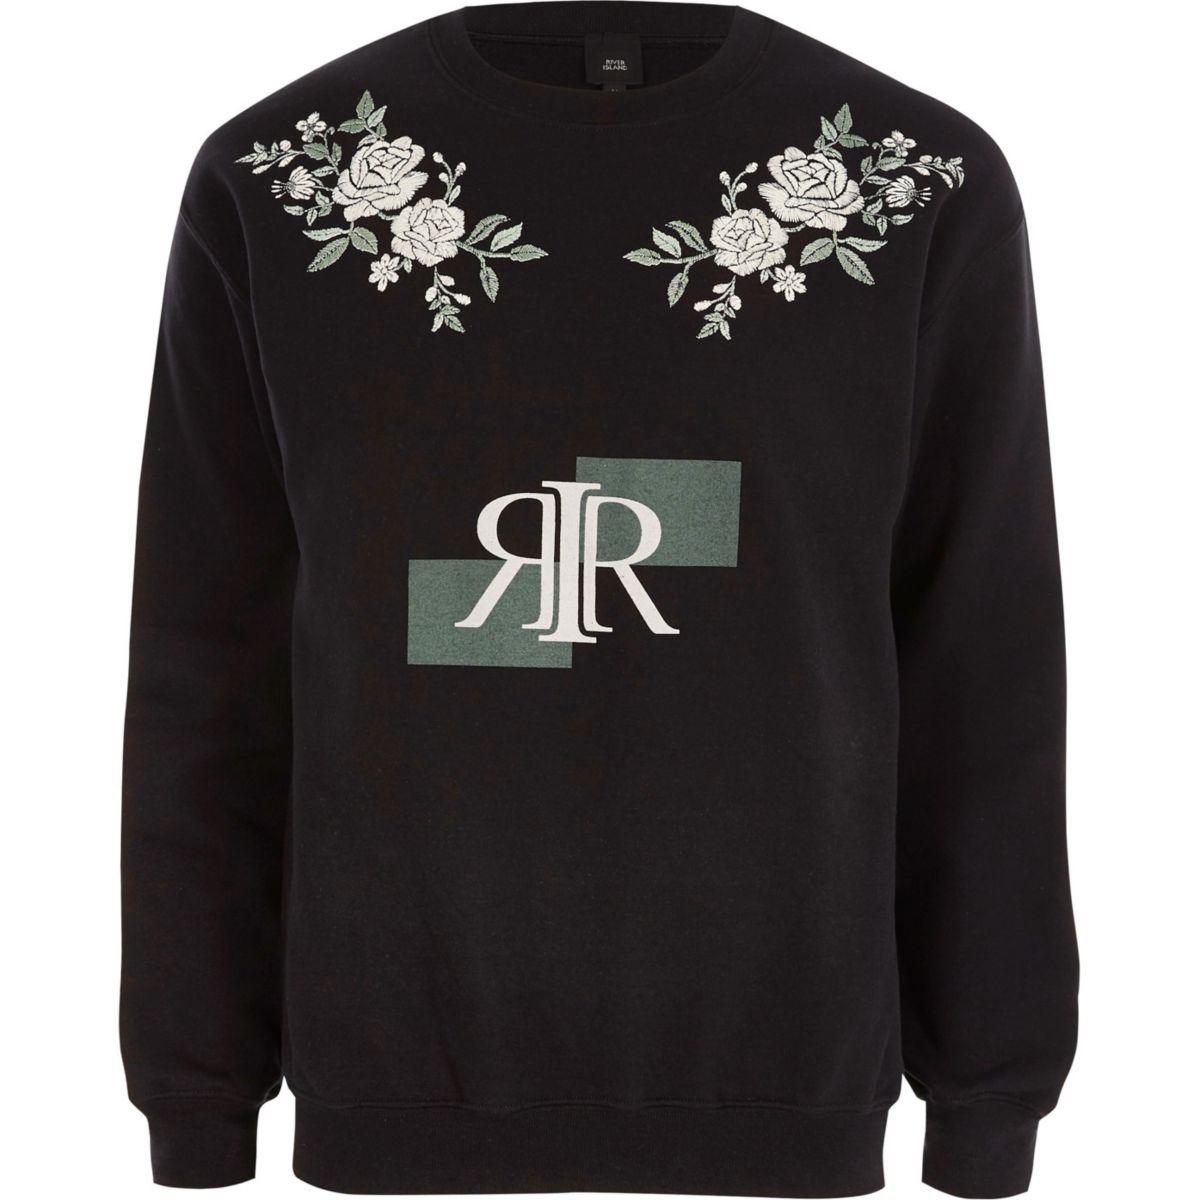 Black RI print floral embroidered sweatshirt